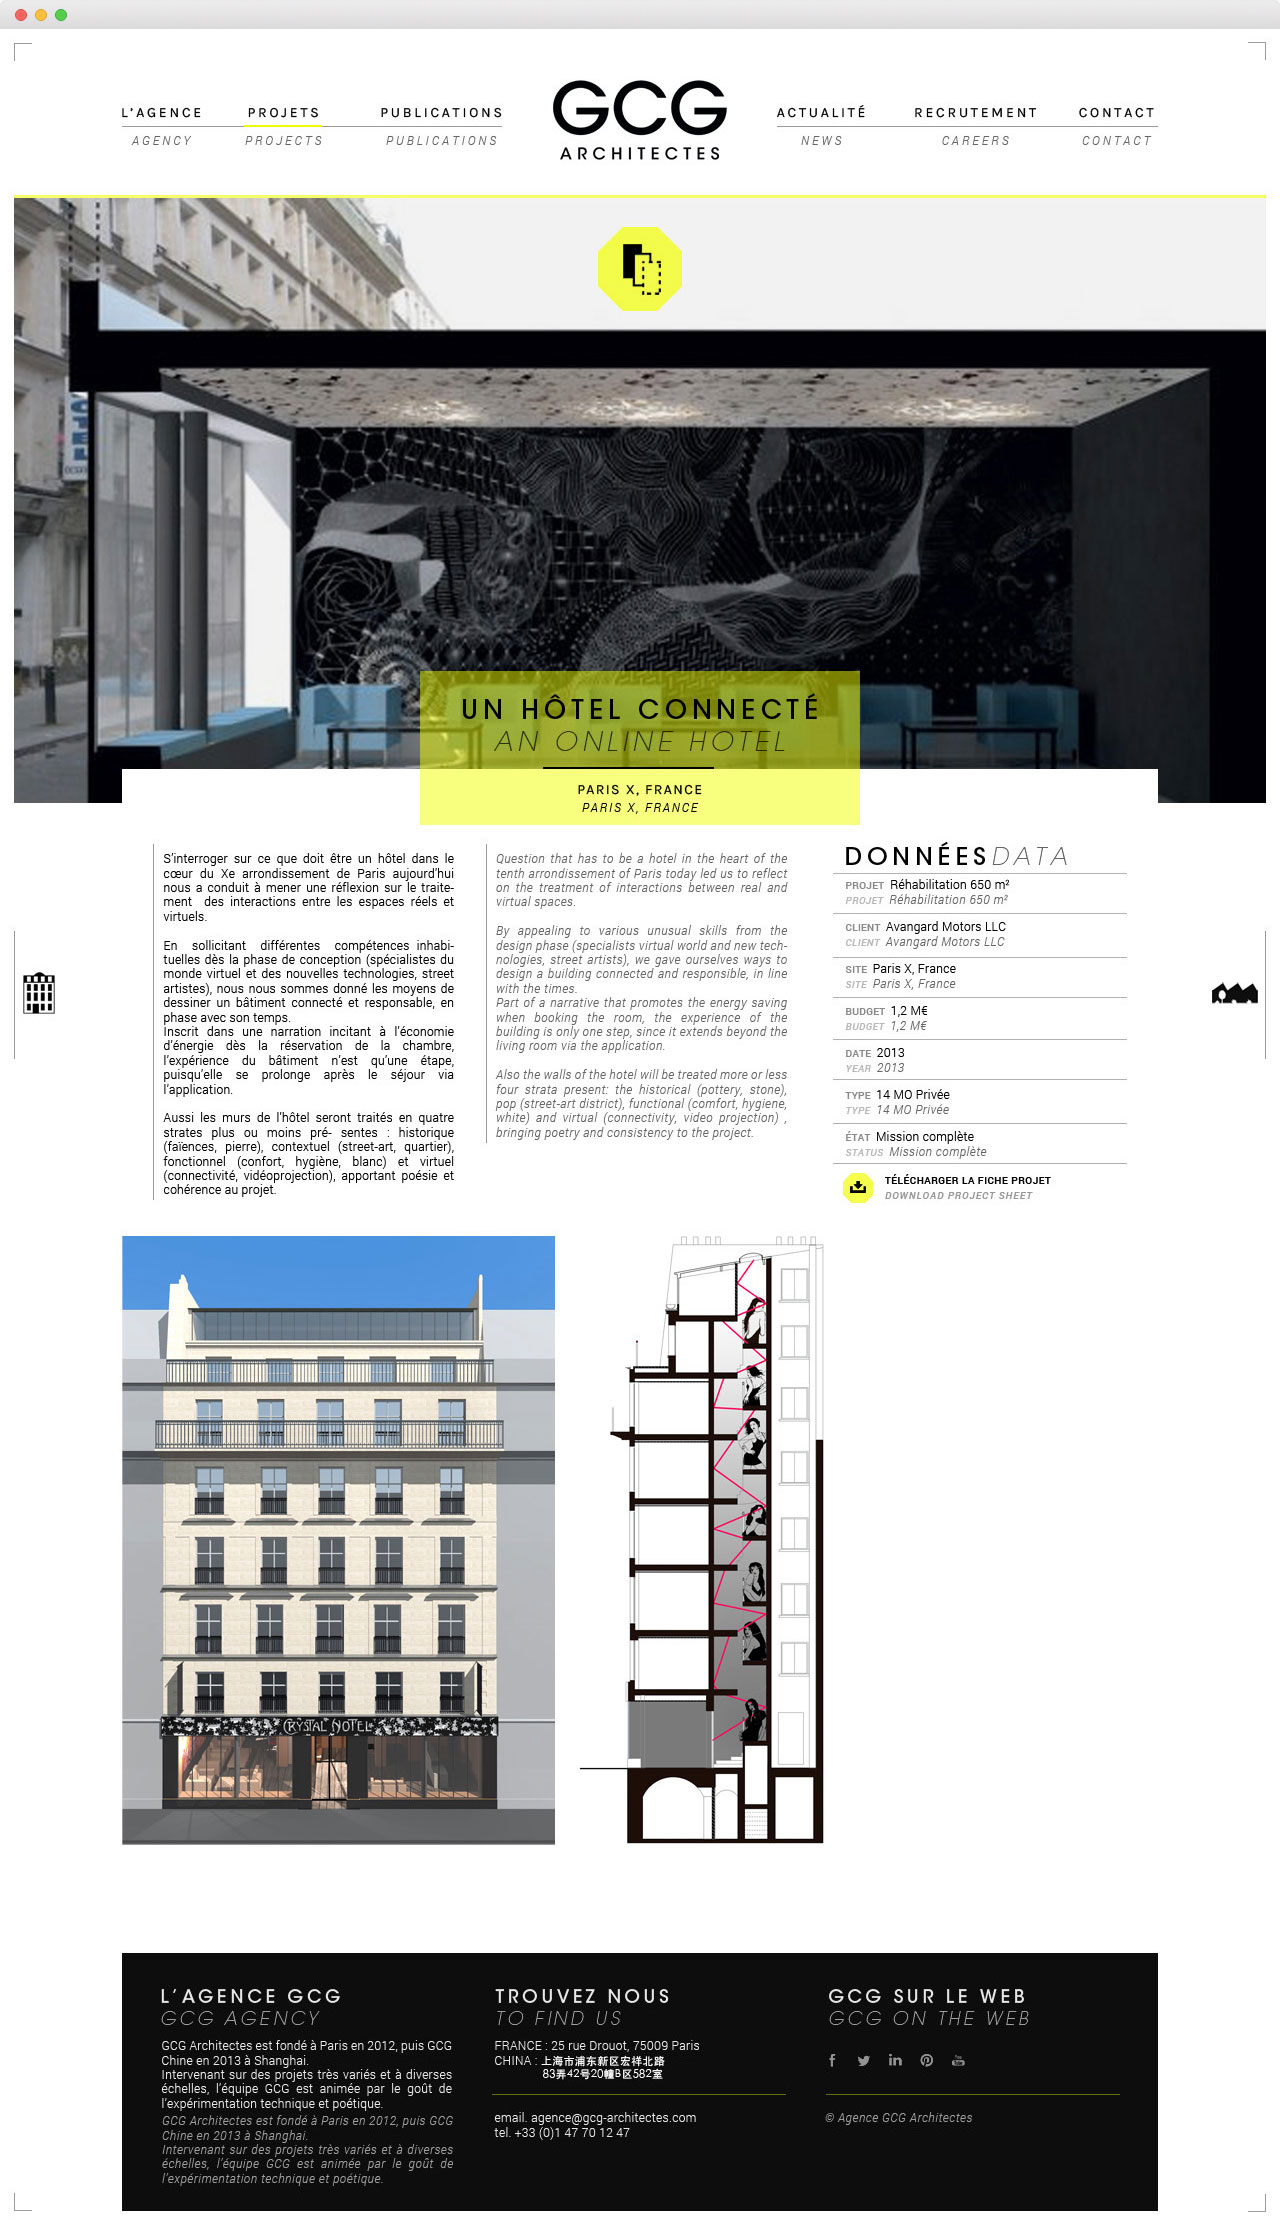 Perfect responsive website for the parisian architects gcg - Appartement duplex alvhem makleri goteborg ...